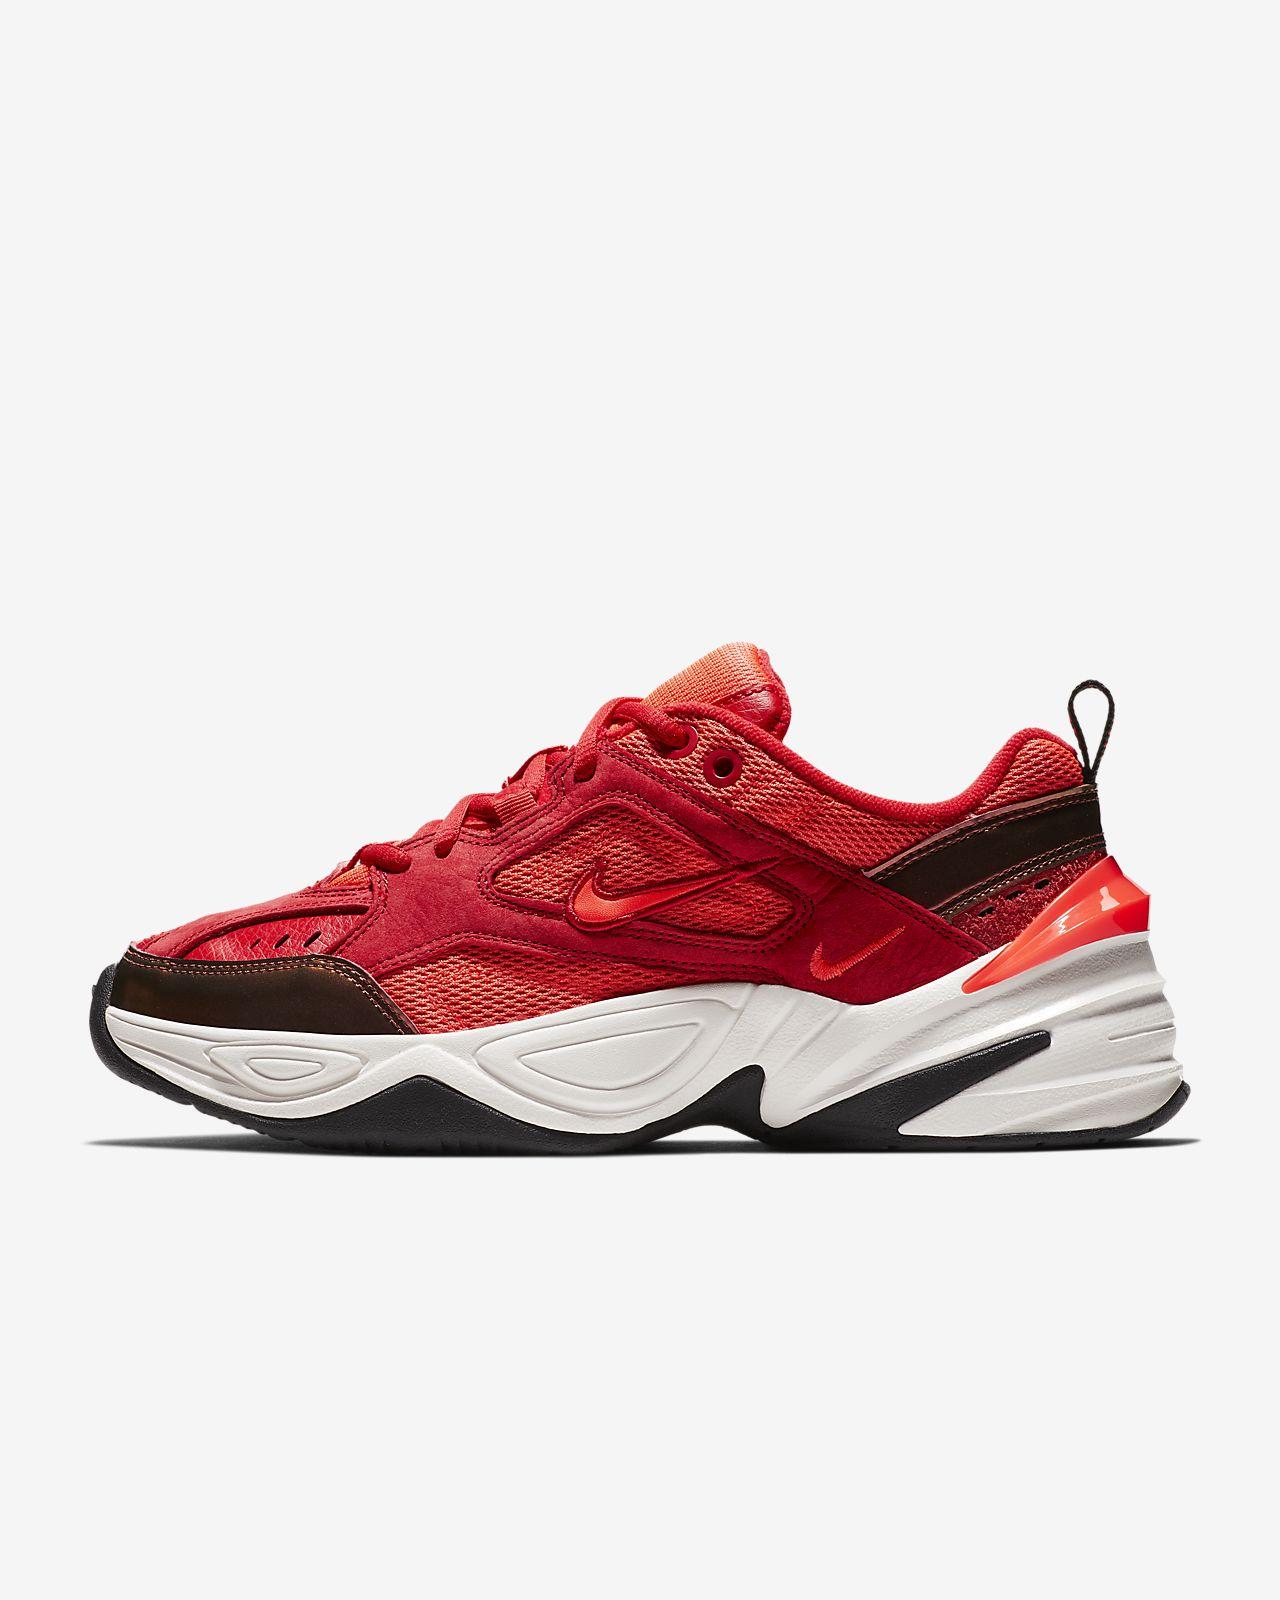 quality design a178e 49bb1 ... official chaussure nike m2k tekno mesh pour femme 04bda ae87f